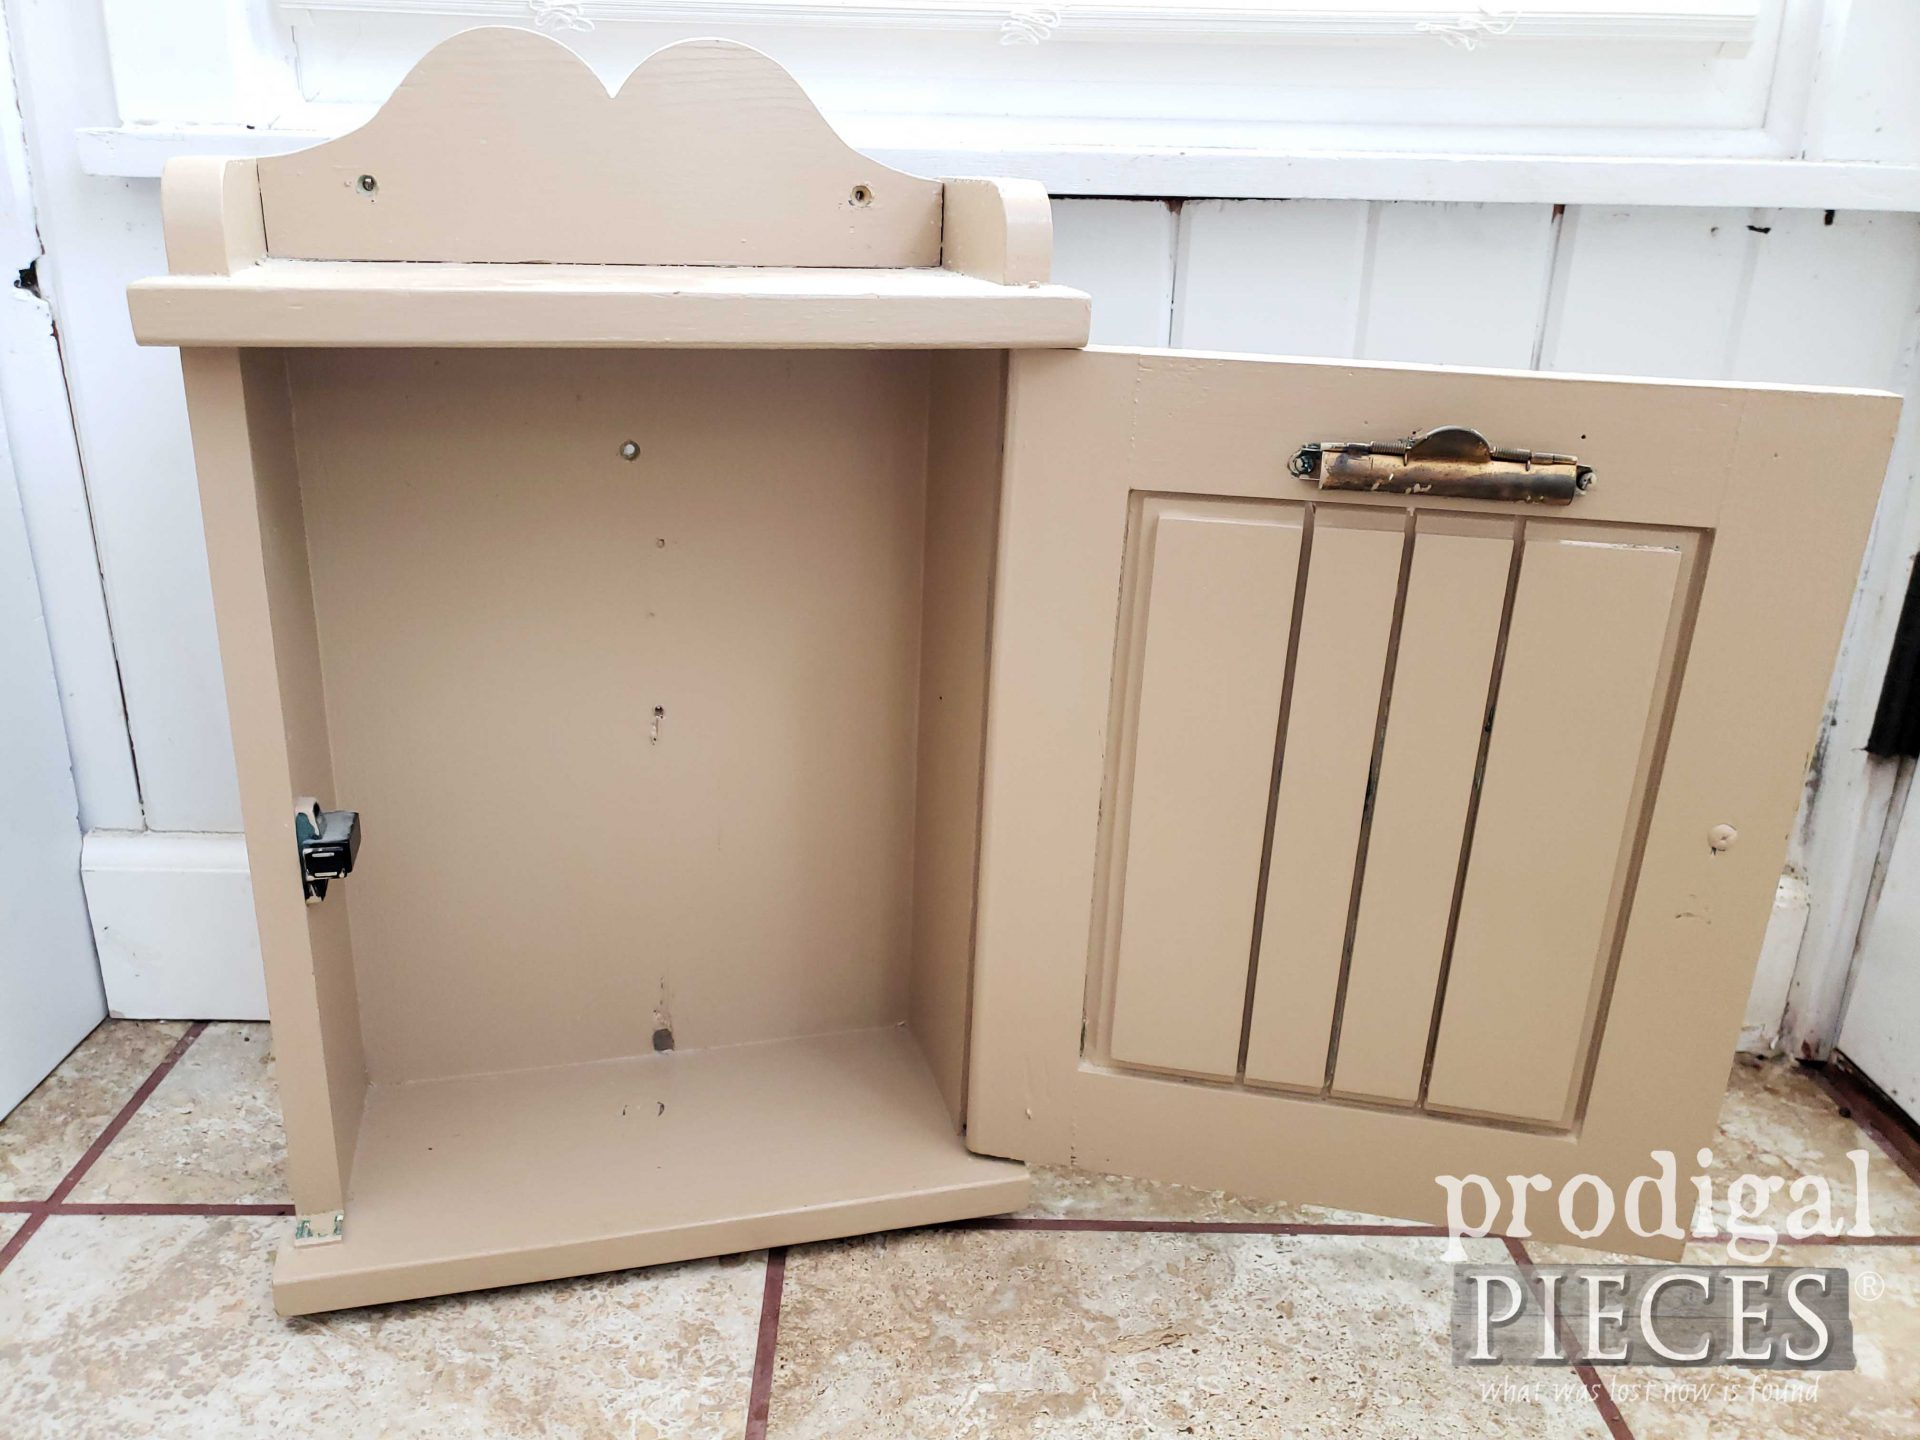 Open Handmade Vintage Medicine Cabinet | prodigalpieces.com